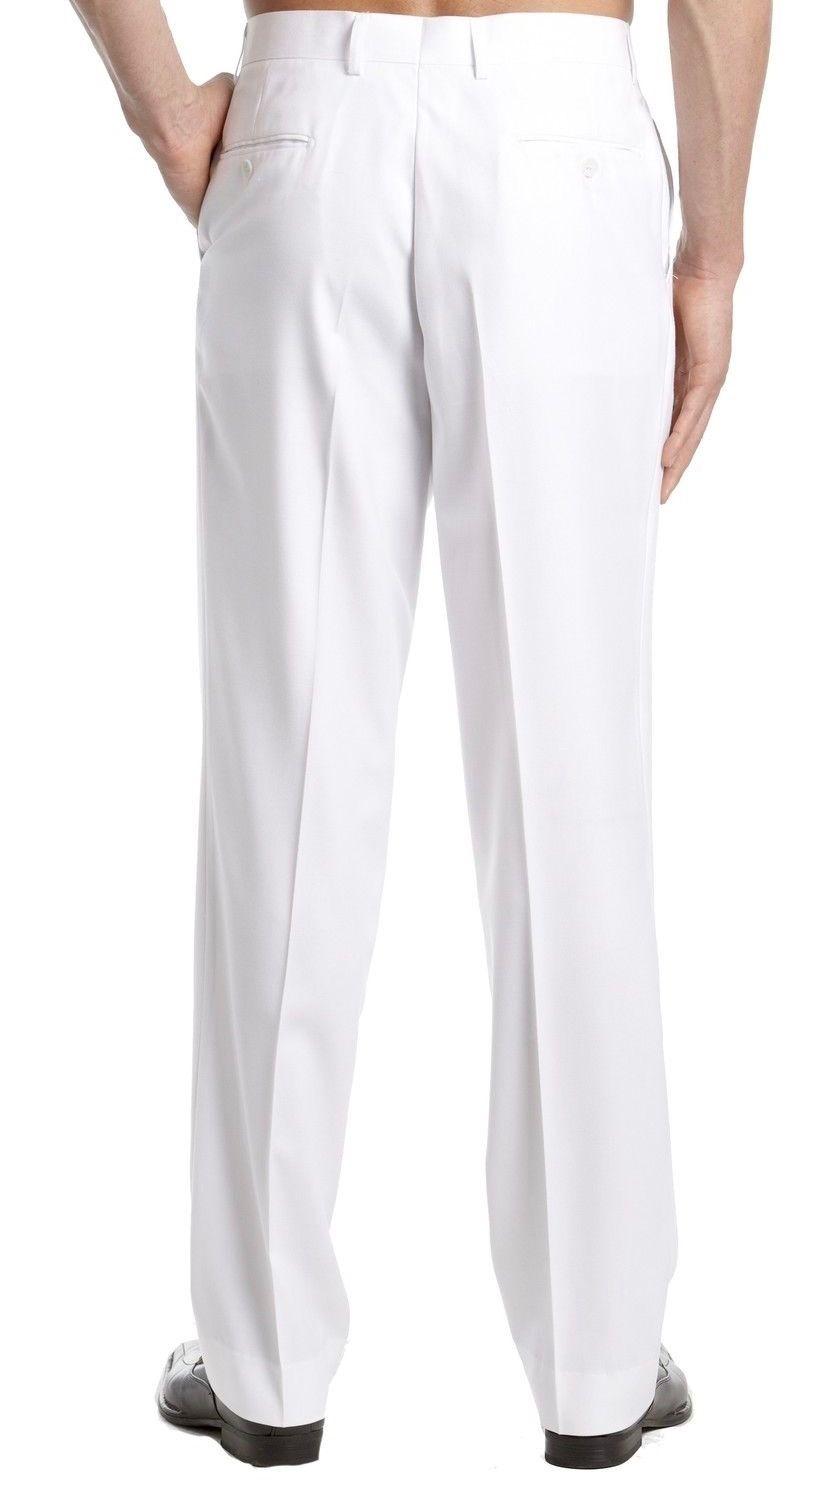 TM-Exposure-Men-039-s-Premium-Slim-Fit-Dress-Pants-Slacks-Flat-Front-Multiple-Colors thumbnail 9